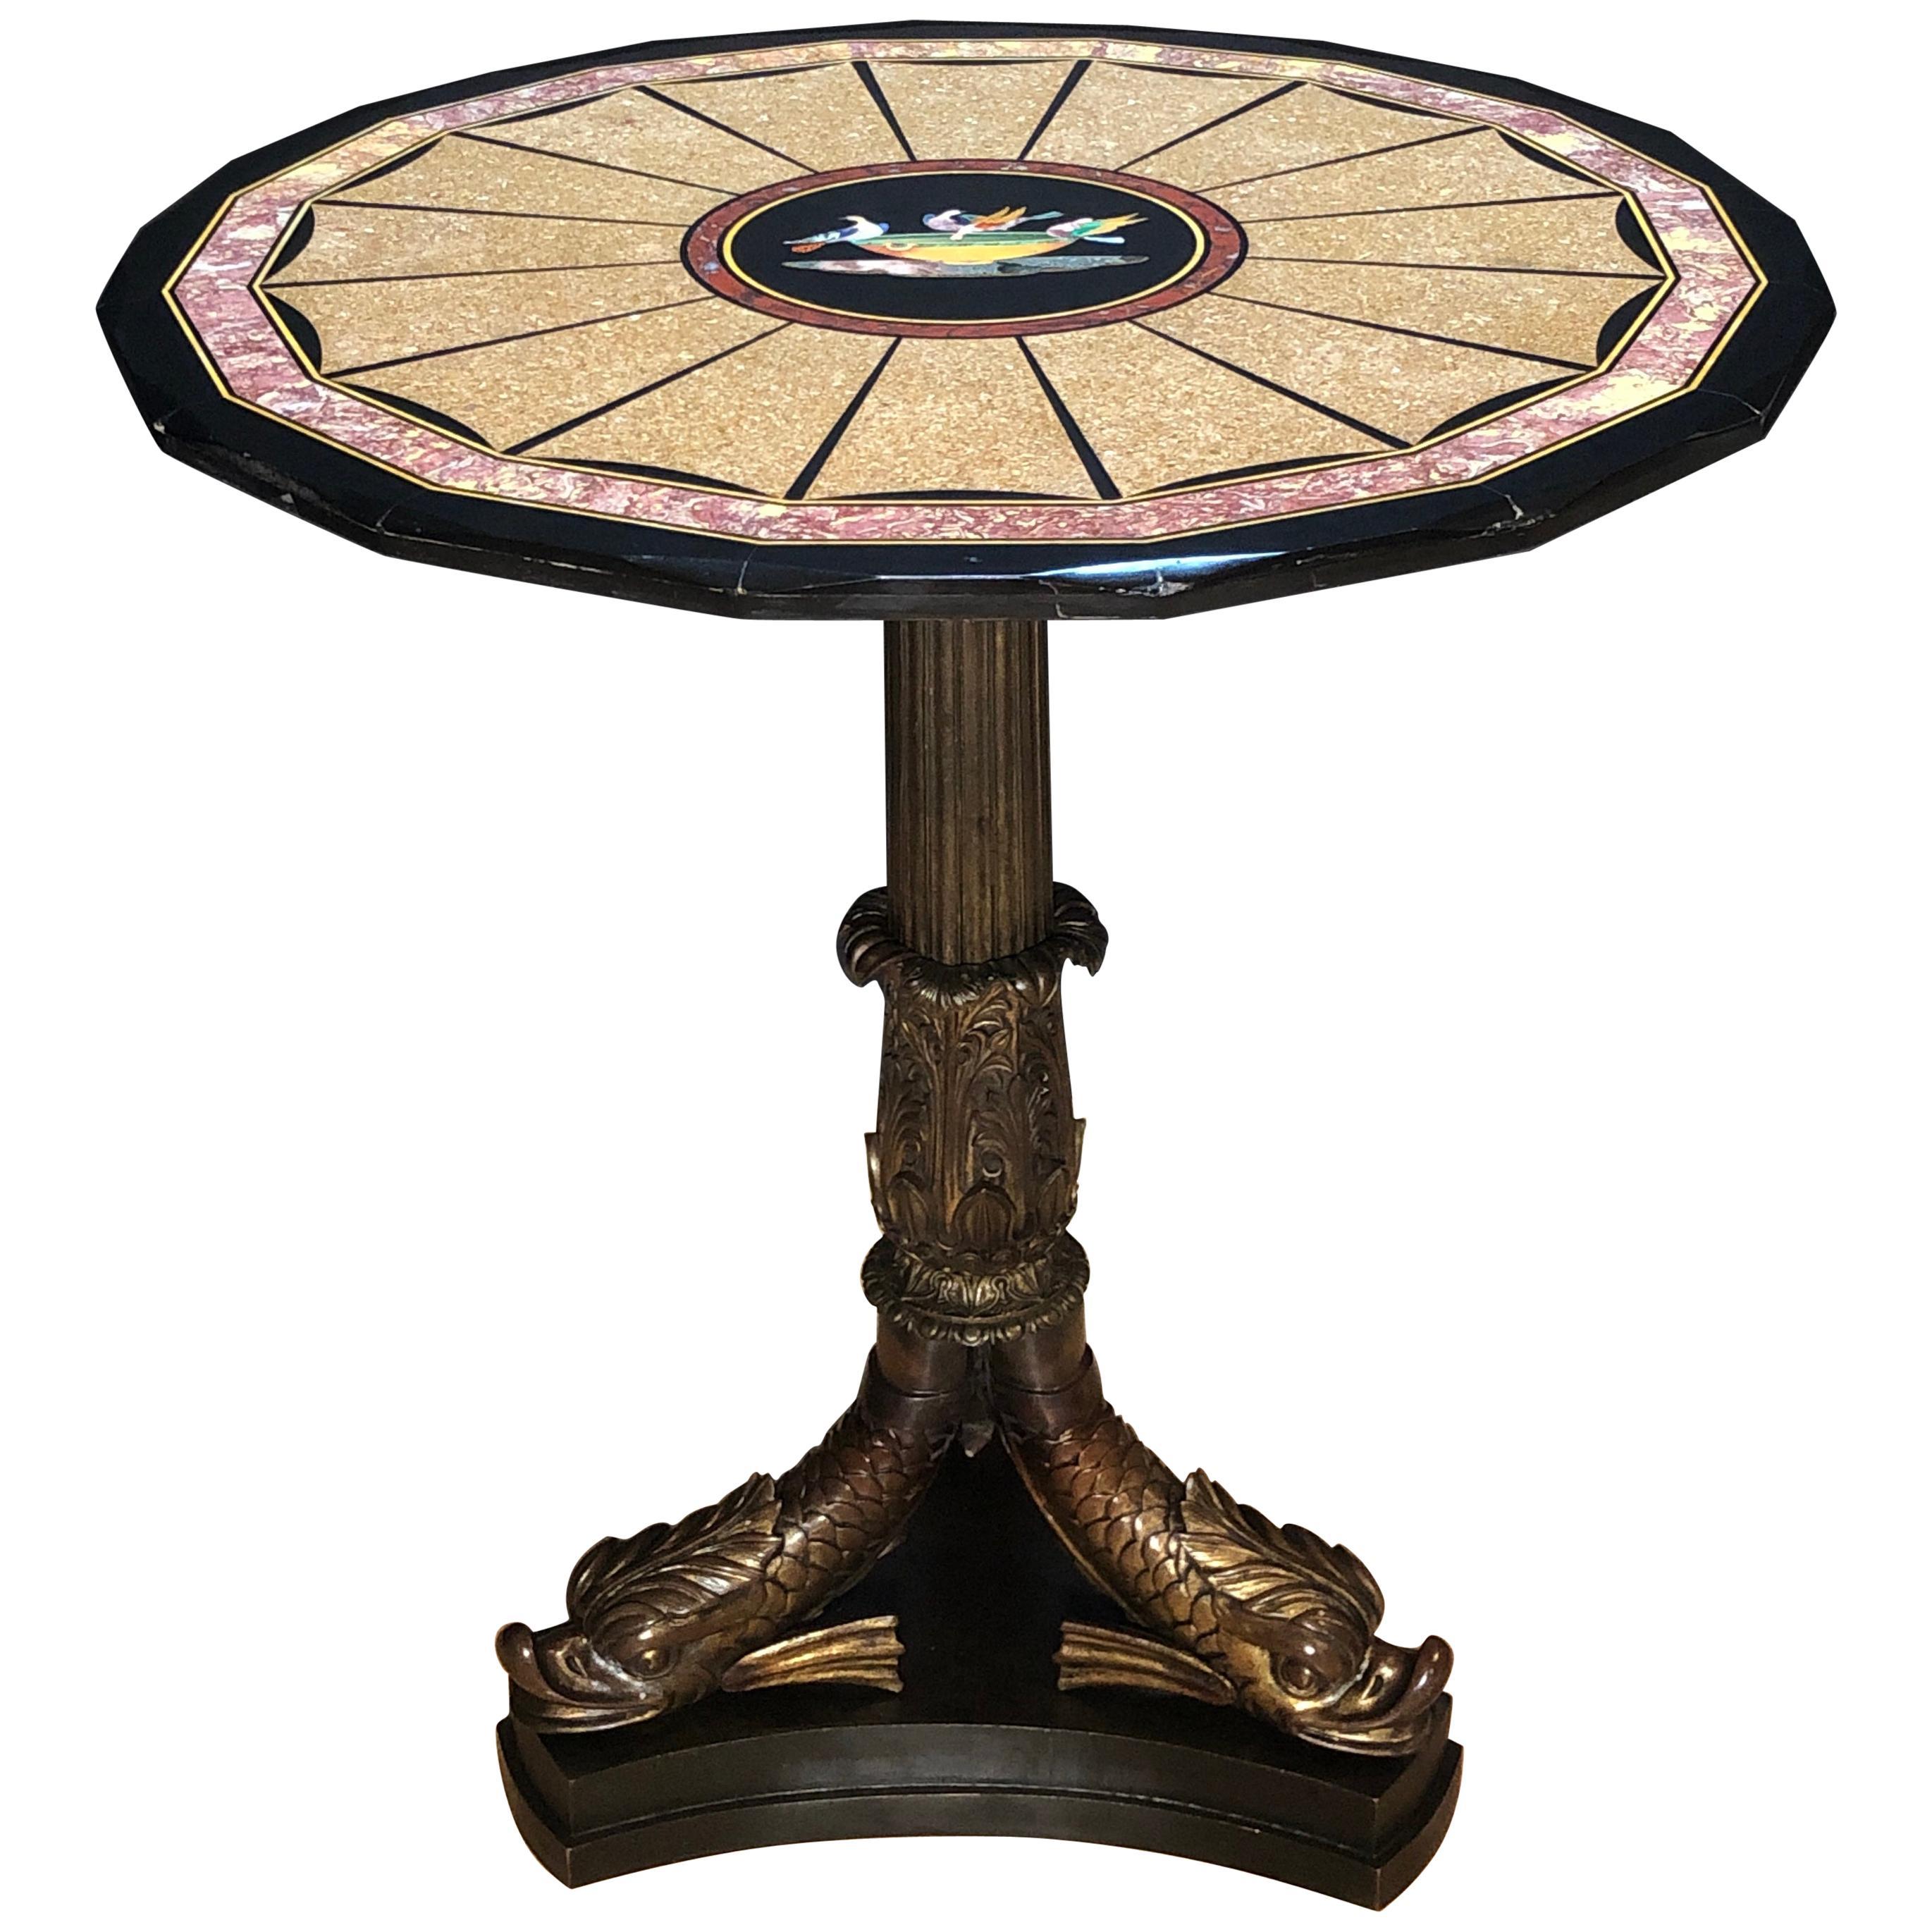 Pietra Dura Specimen Marble and Figural Bronze Center Table